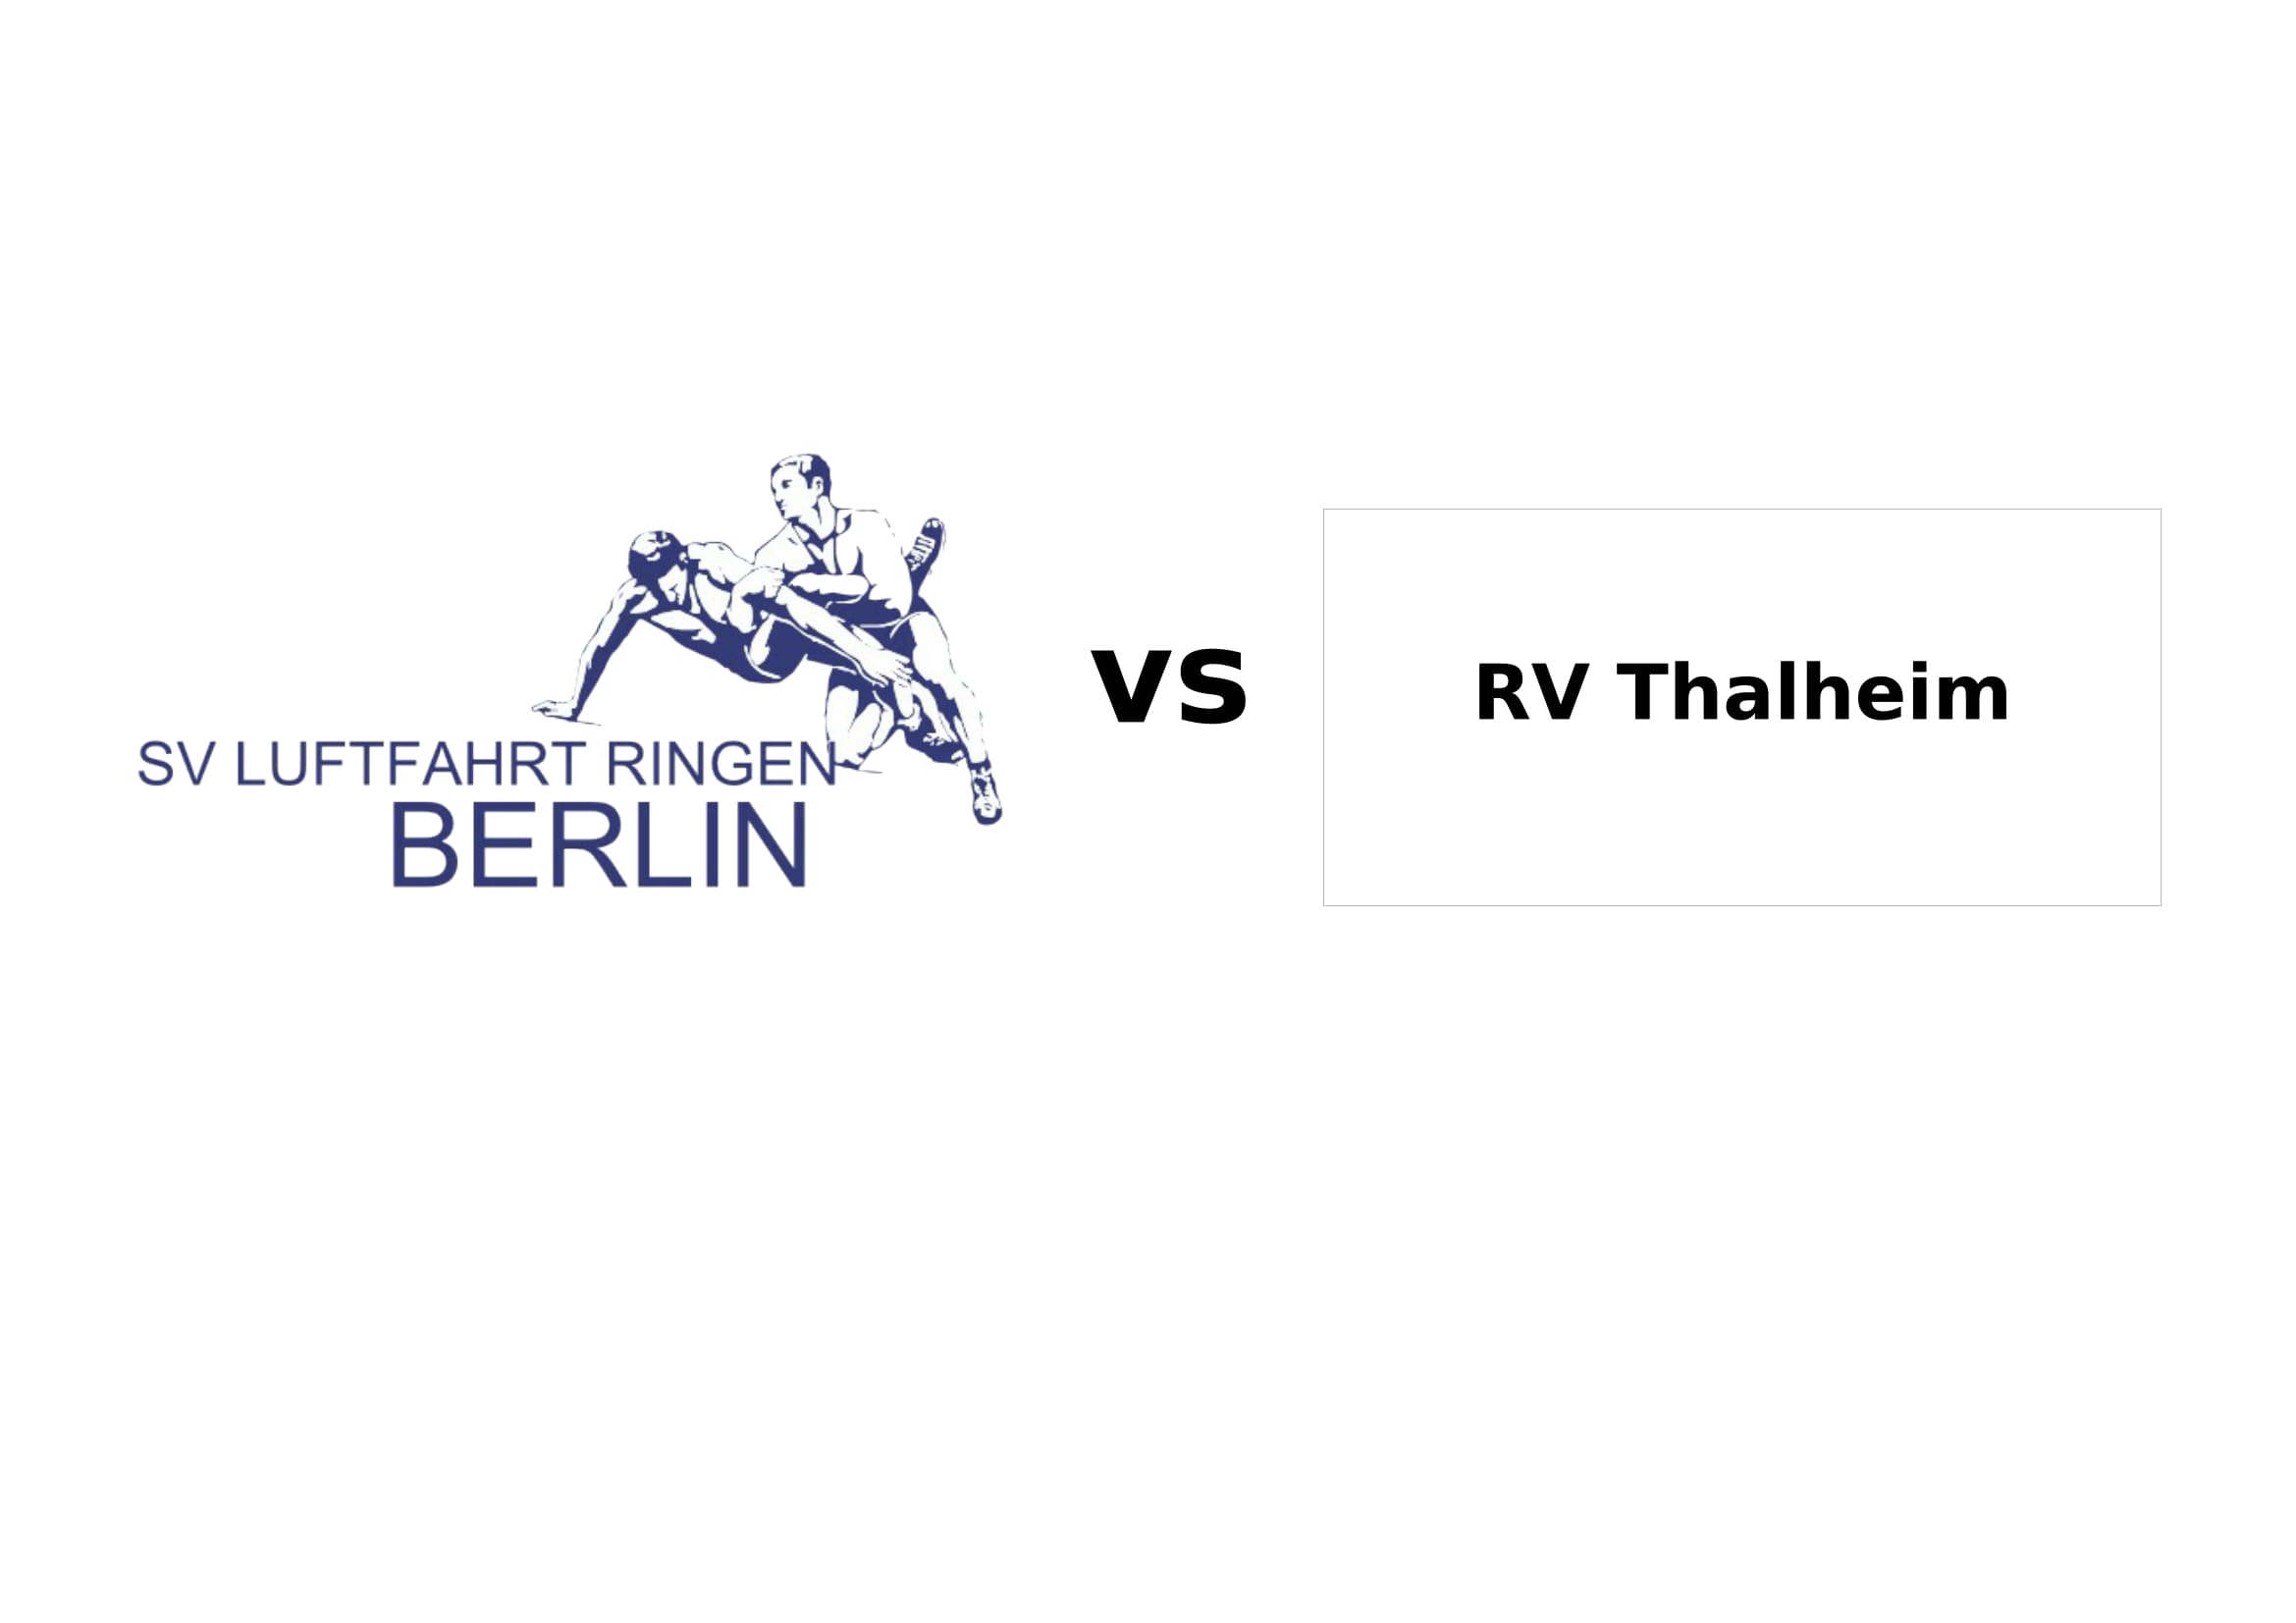 RL-Heimkampf SVL vs. RV Thalheim